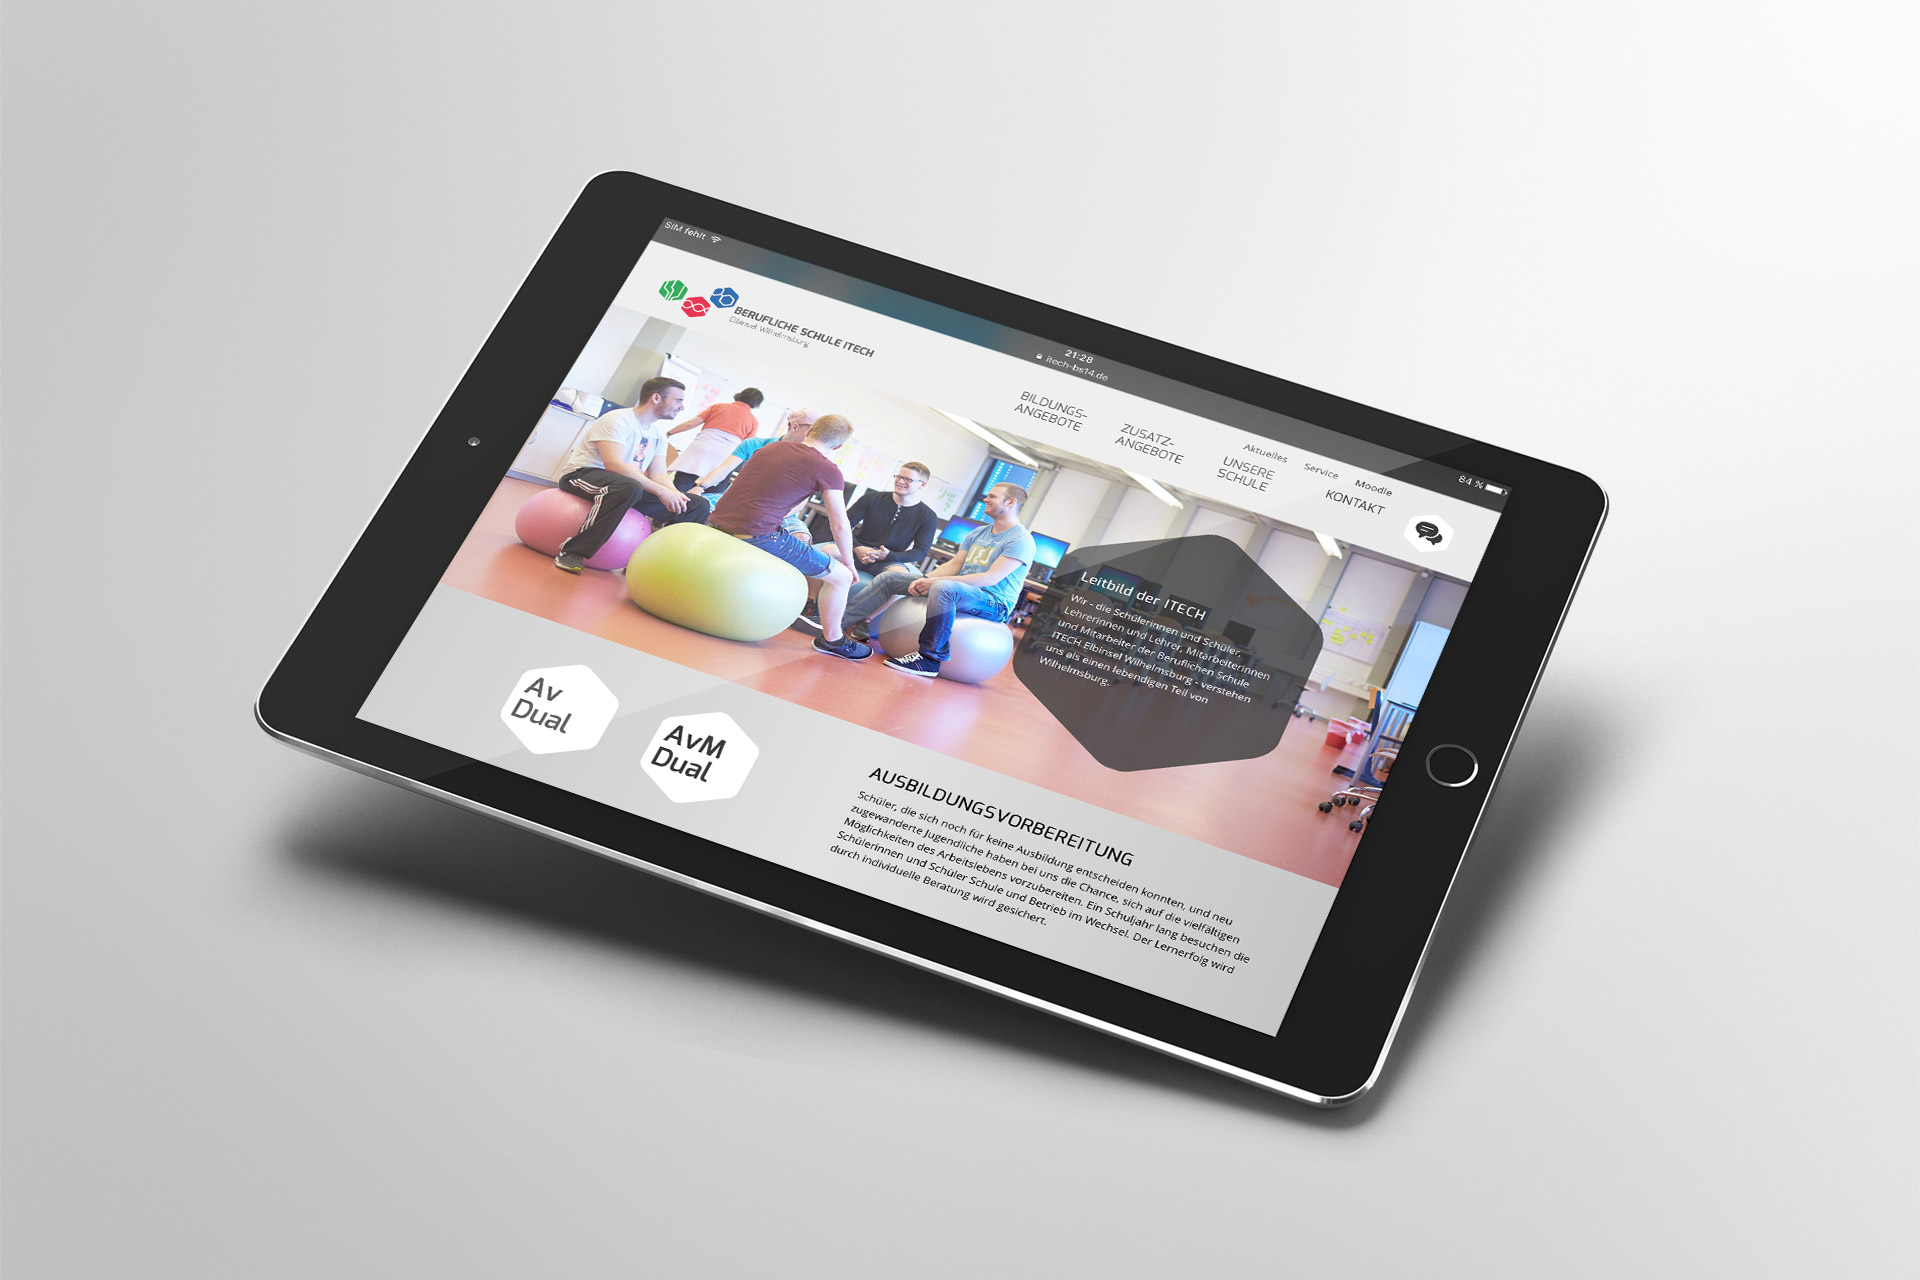 bs-itech-corporate-design webdesign